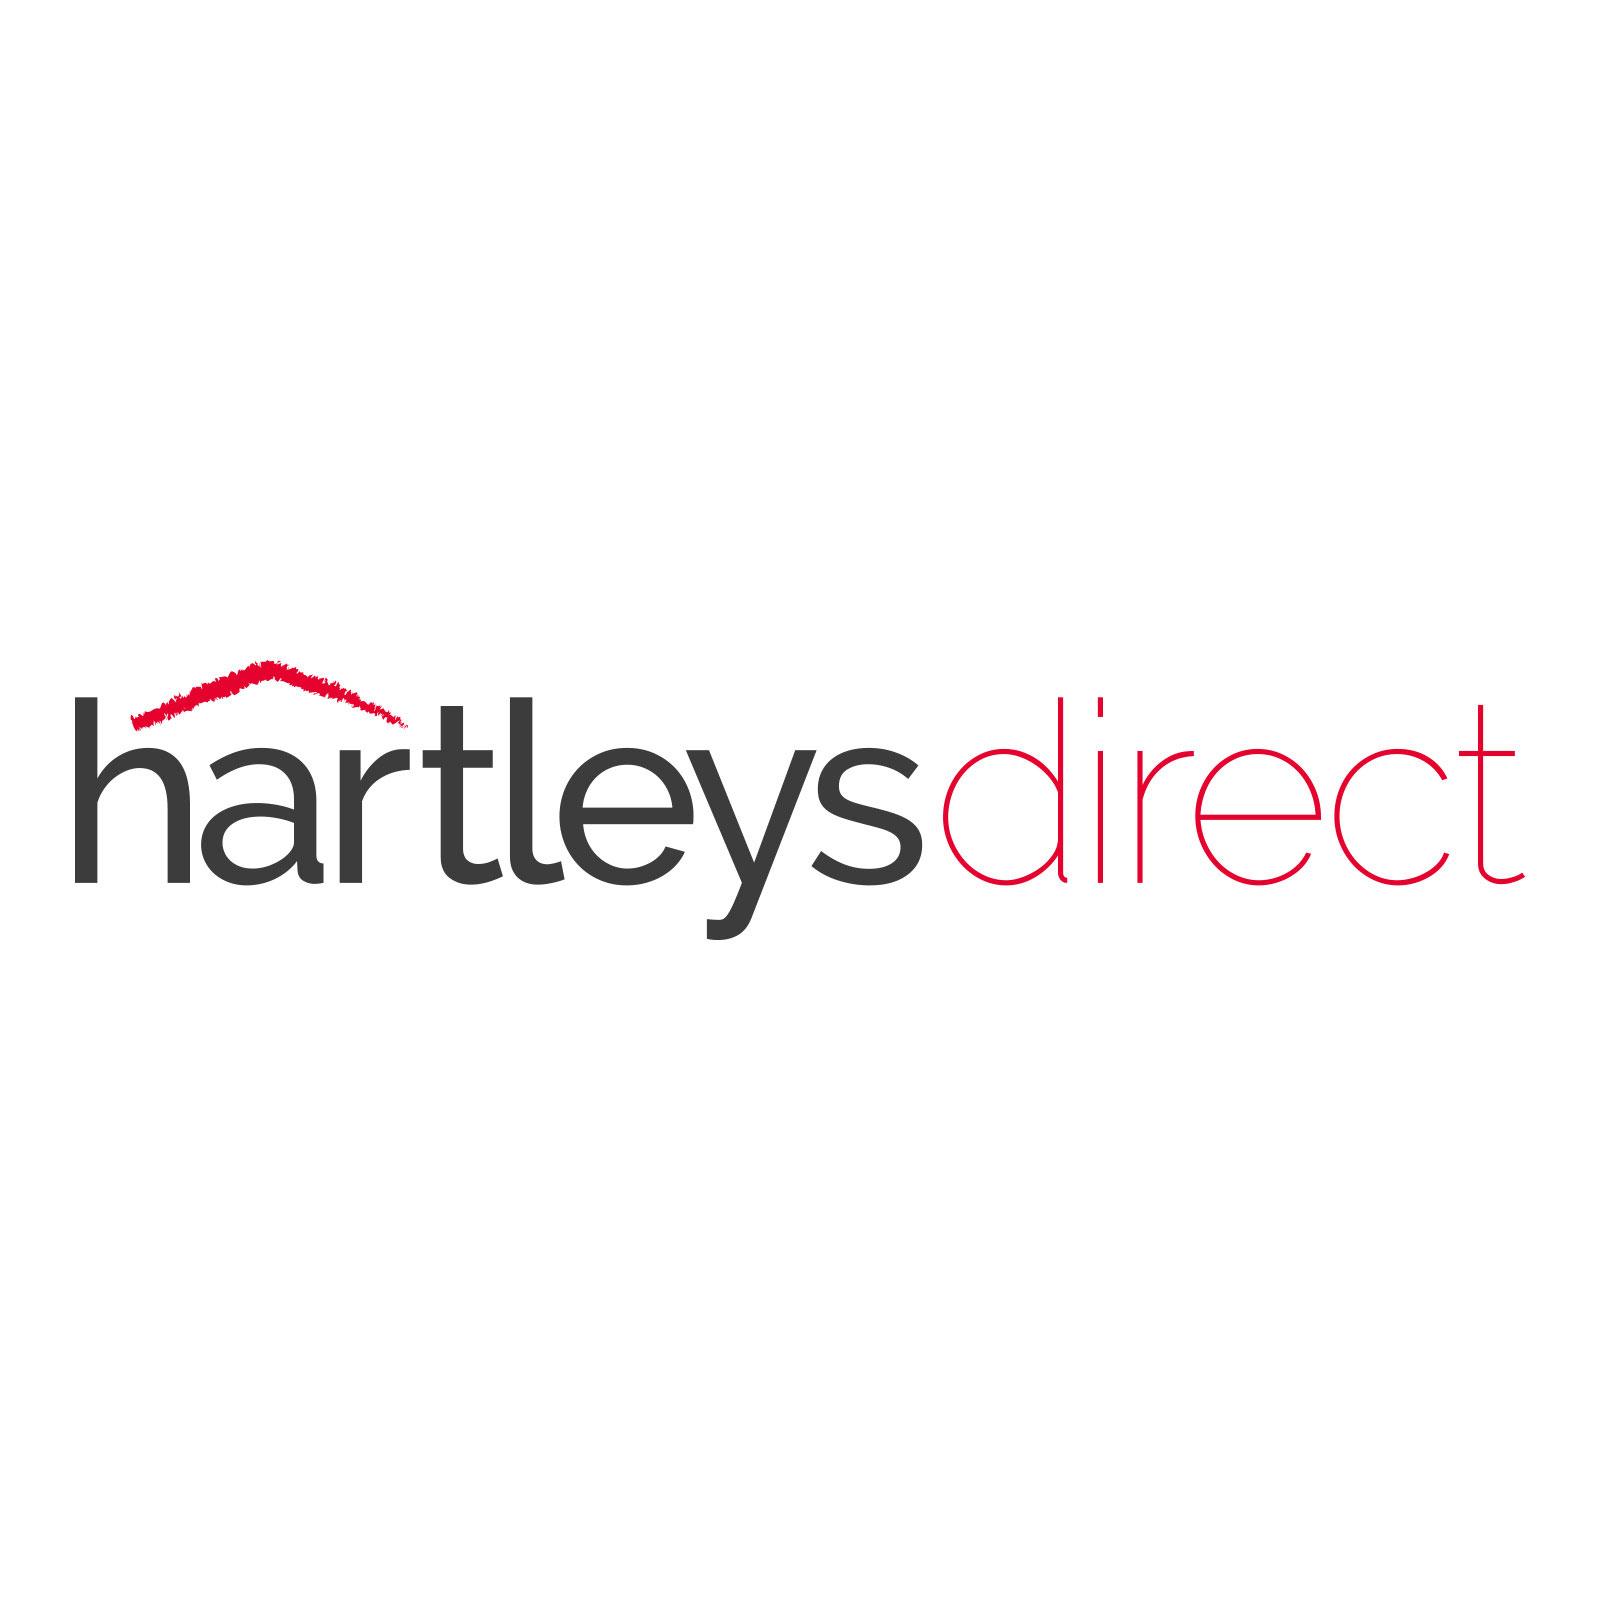 Hartleys-Set-of-4-Gunmetal-Bistro-Chairs-on-White-Background.jpg